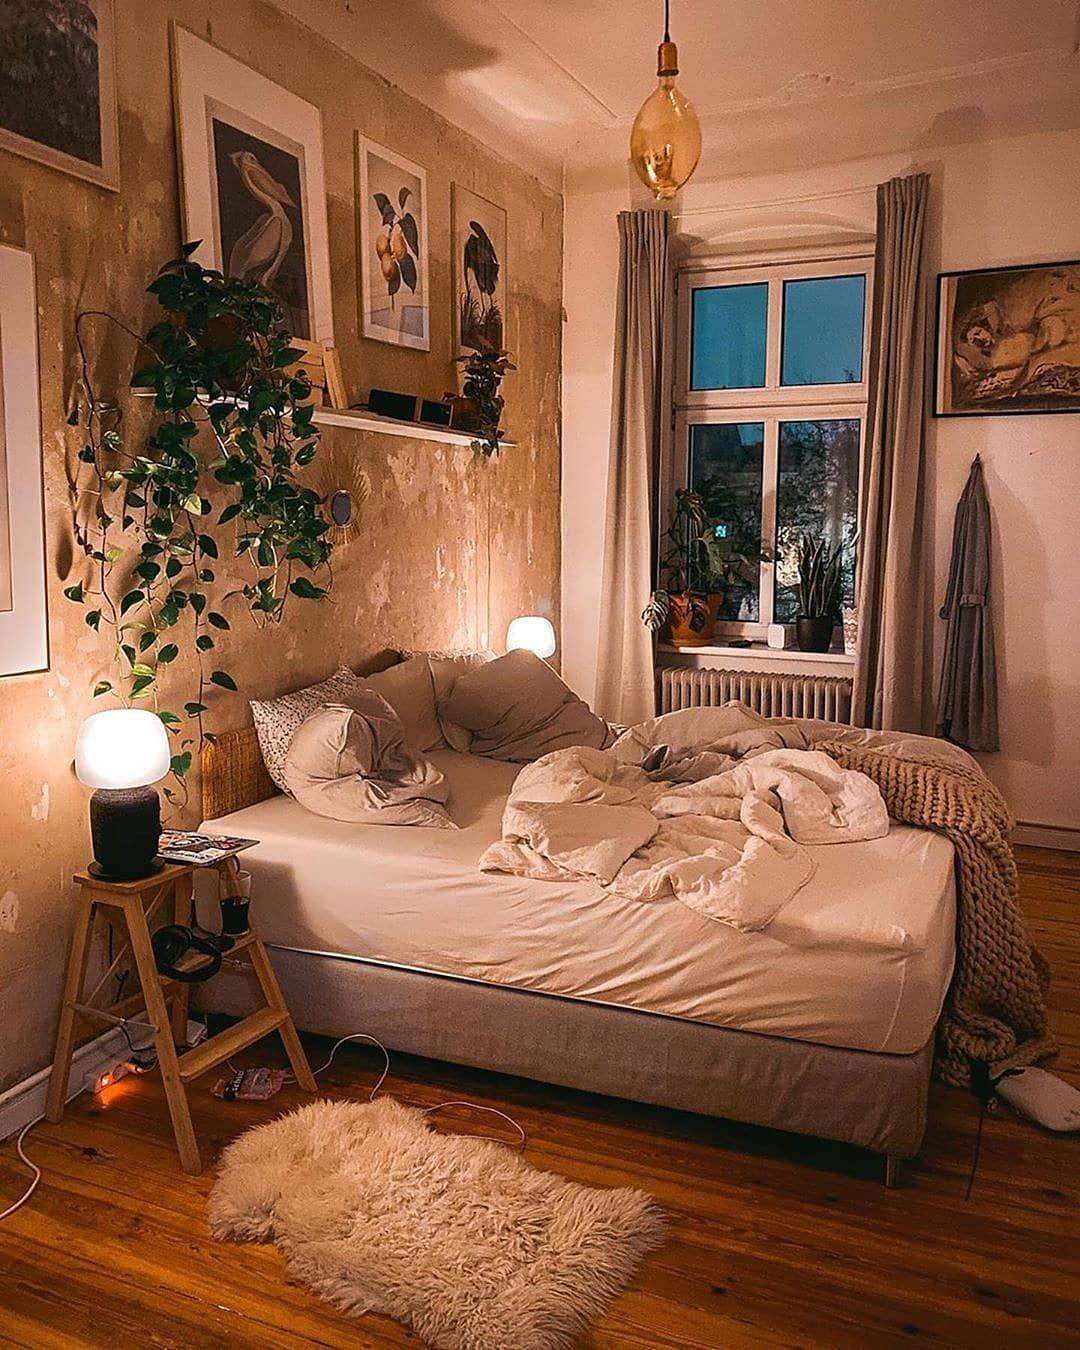 13 9k Likes 50 Comments Home Decor Interior Designs Perfect Homess On Instagram Very Coz Room Design Bedroom Room Inspiration Bedroom Apartment Decor Cosy studio bedroom designs